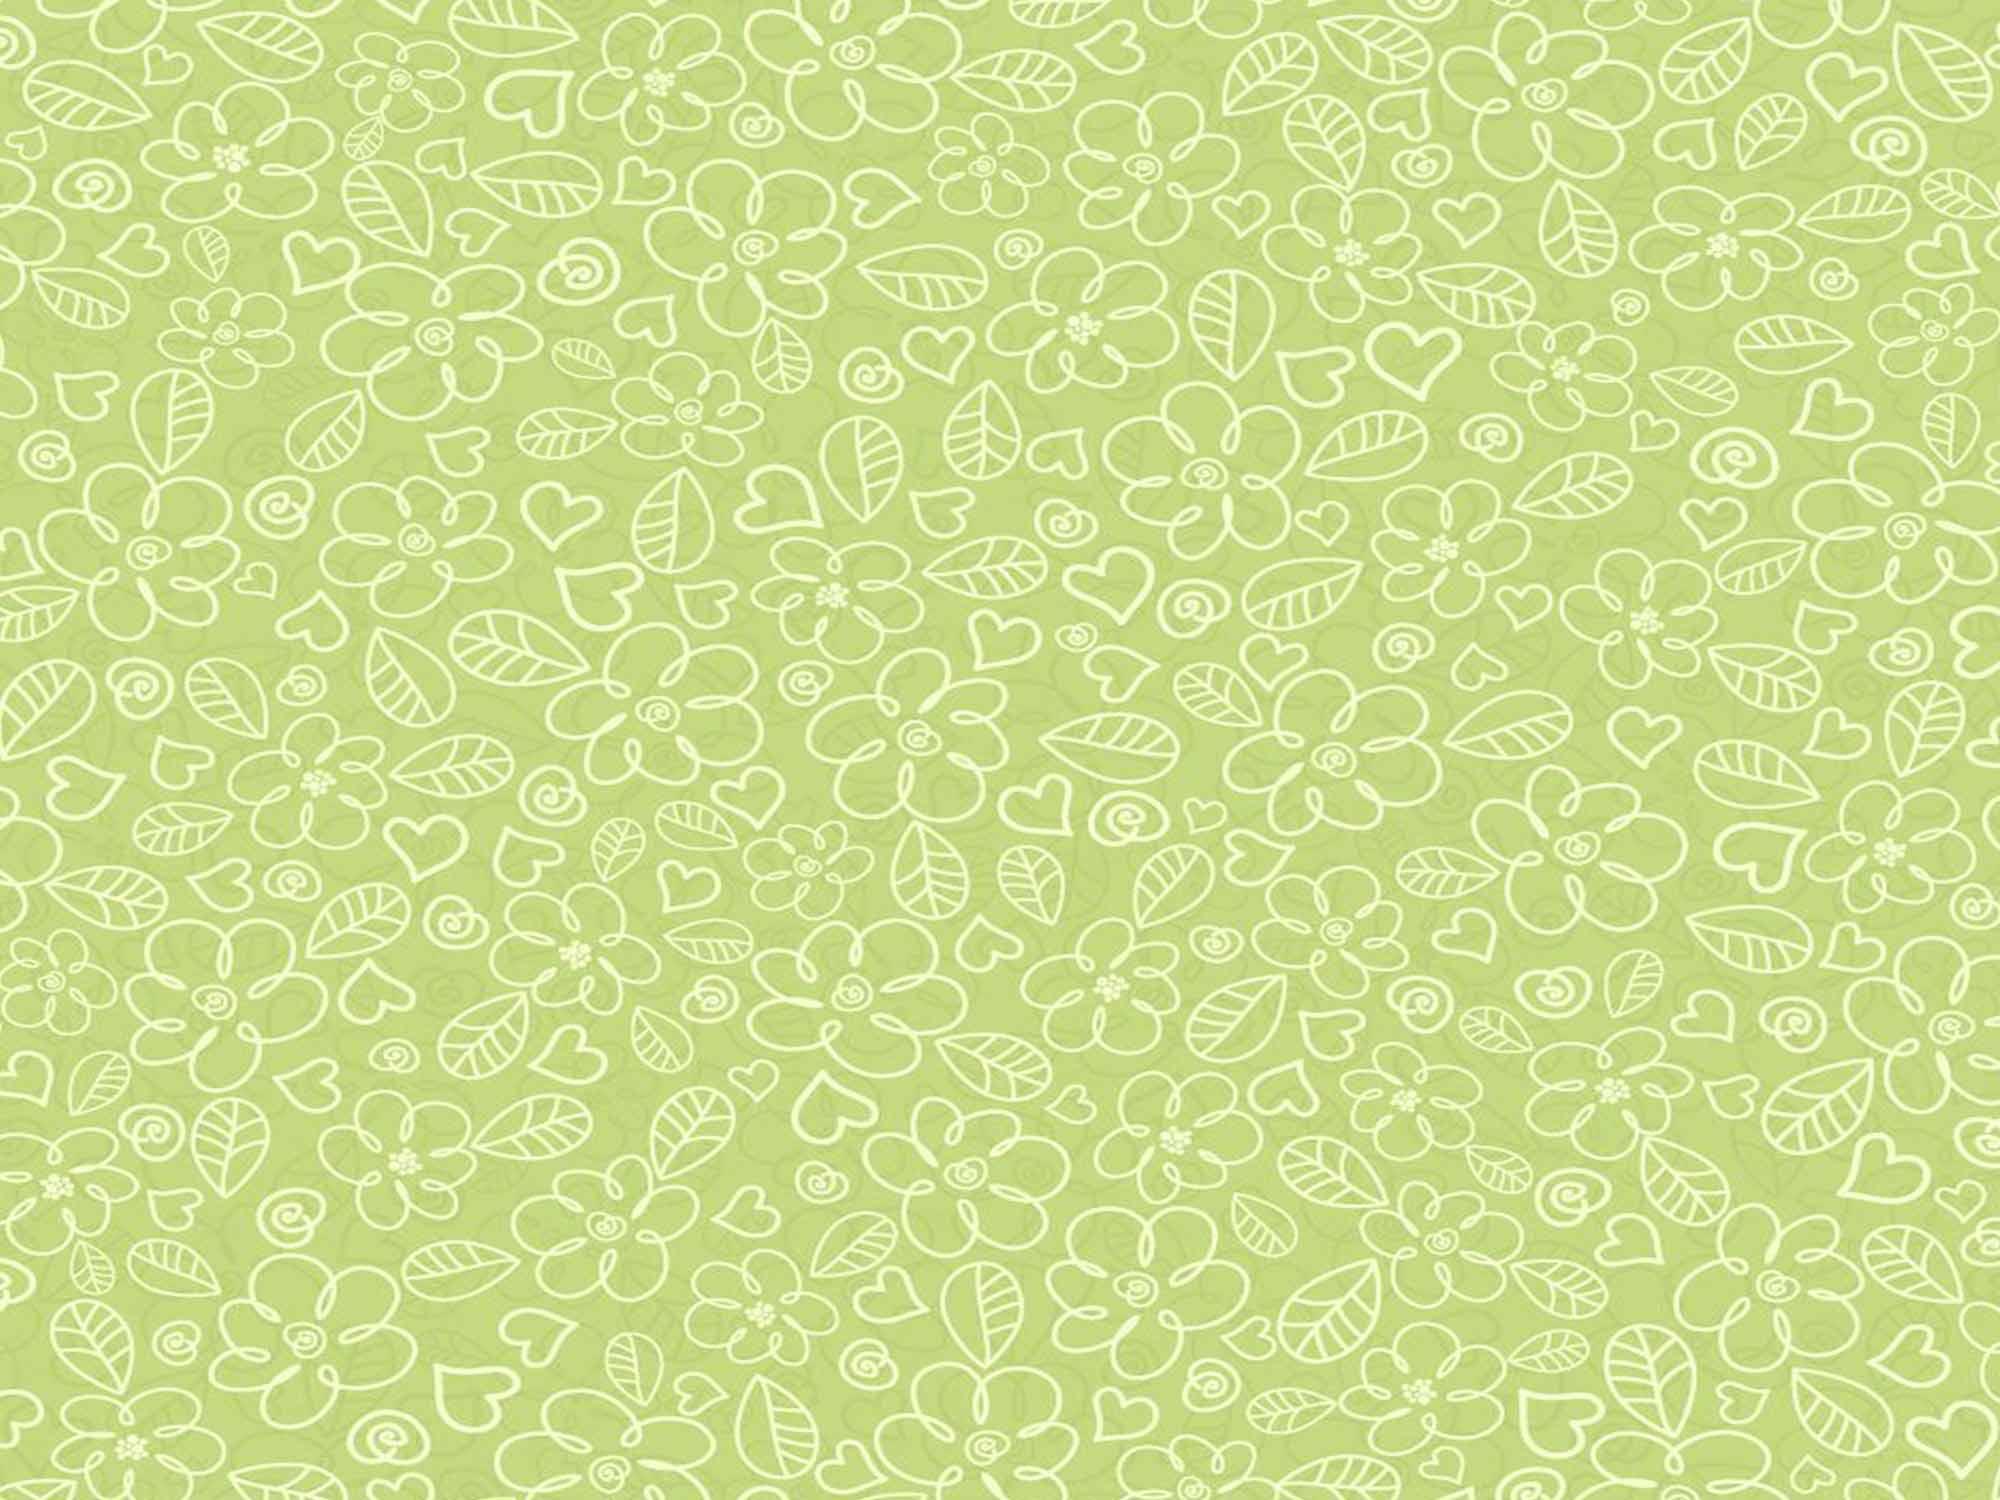 Papel de Parede Floral 0071 - Adesivos de Parede  - Paredes Decoradas